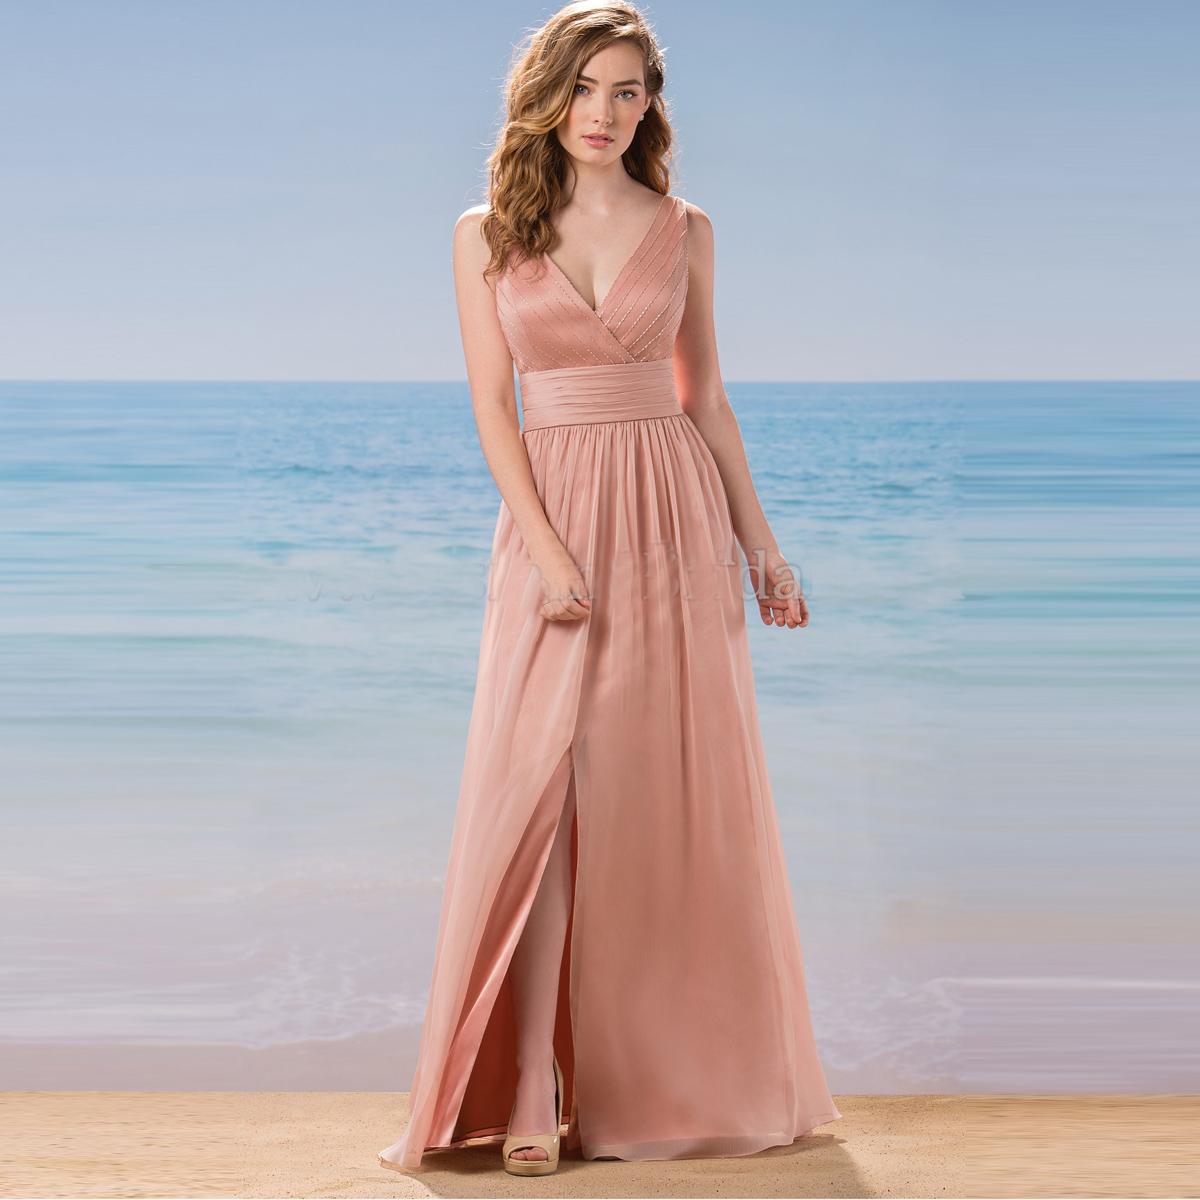 V-neck Long Chiffon Prom dress beaded Evening Gowns women Dress 2016 ...